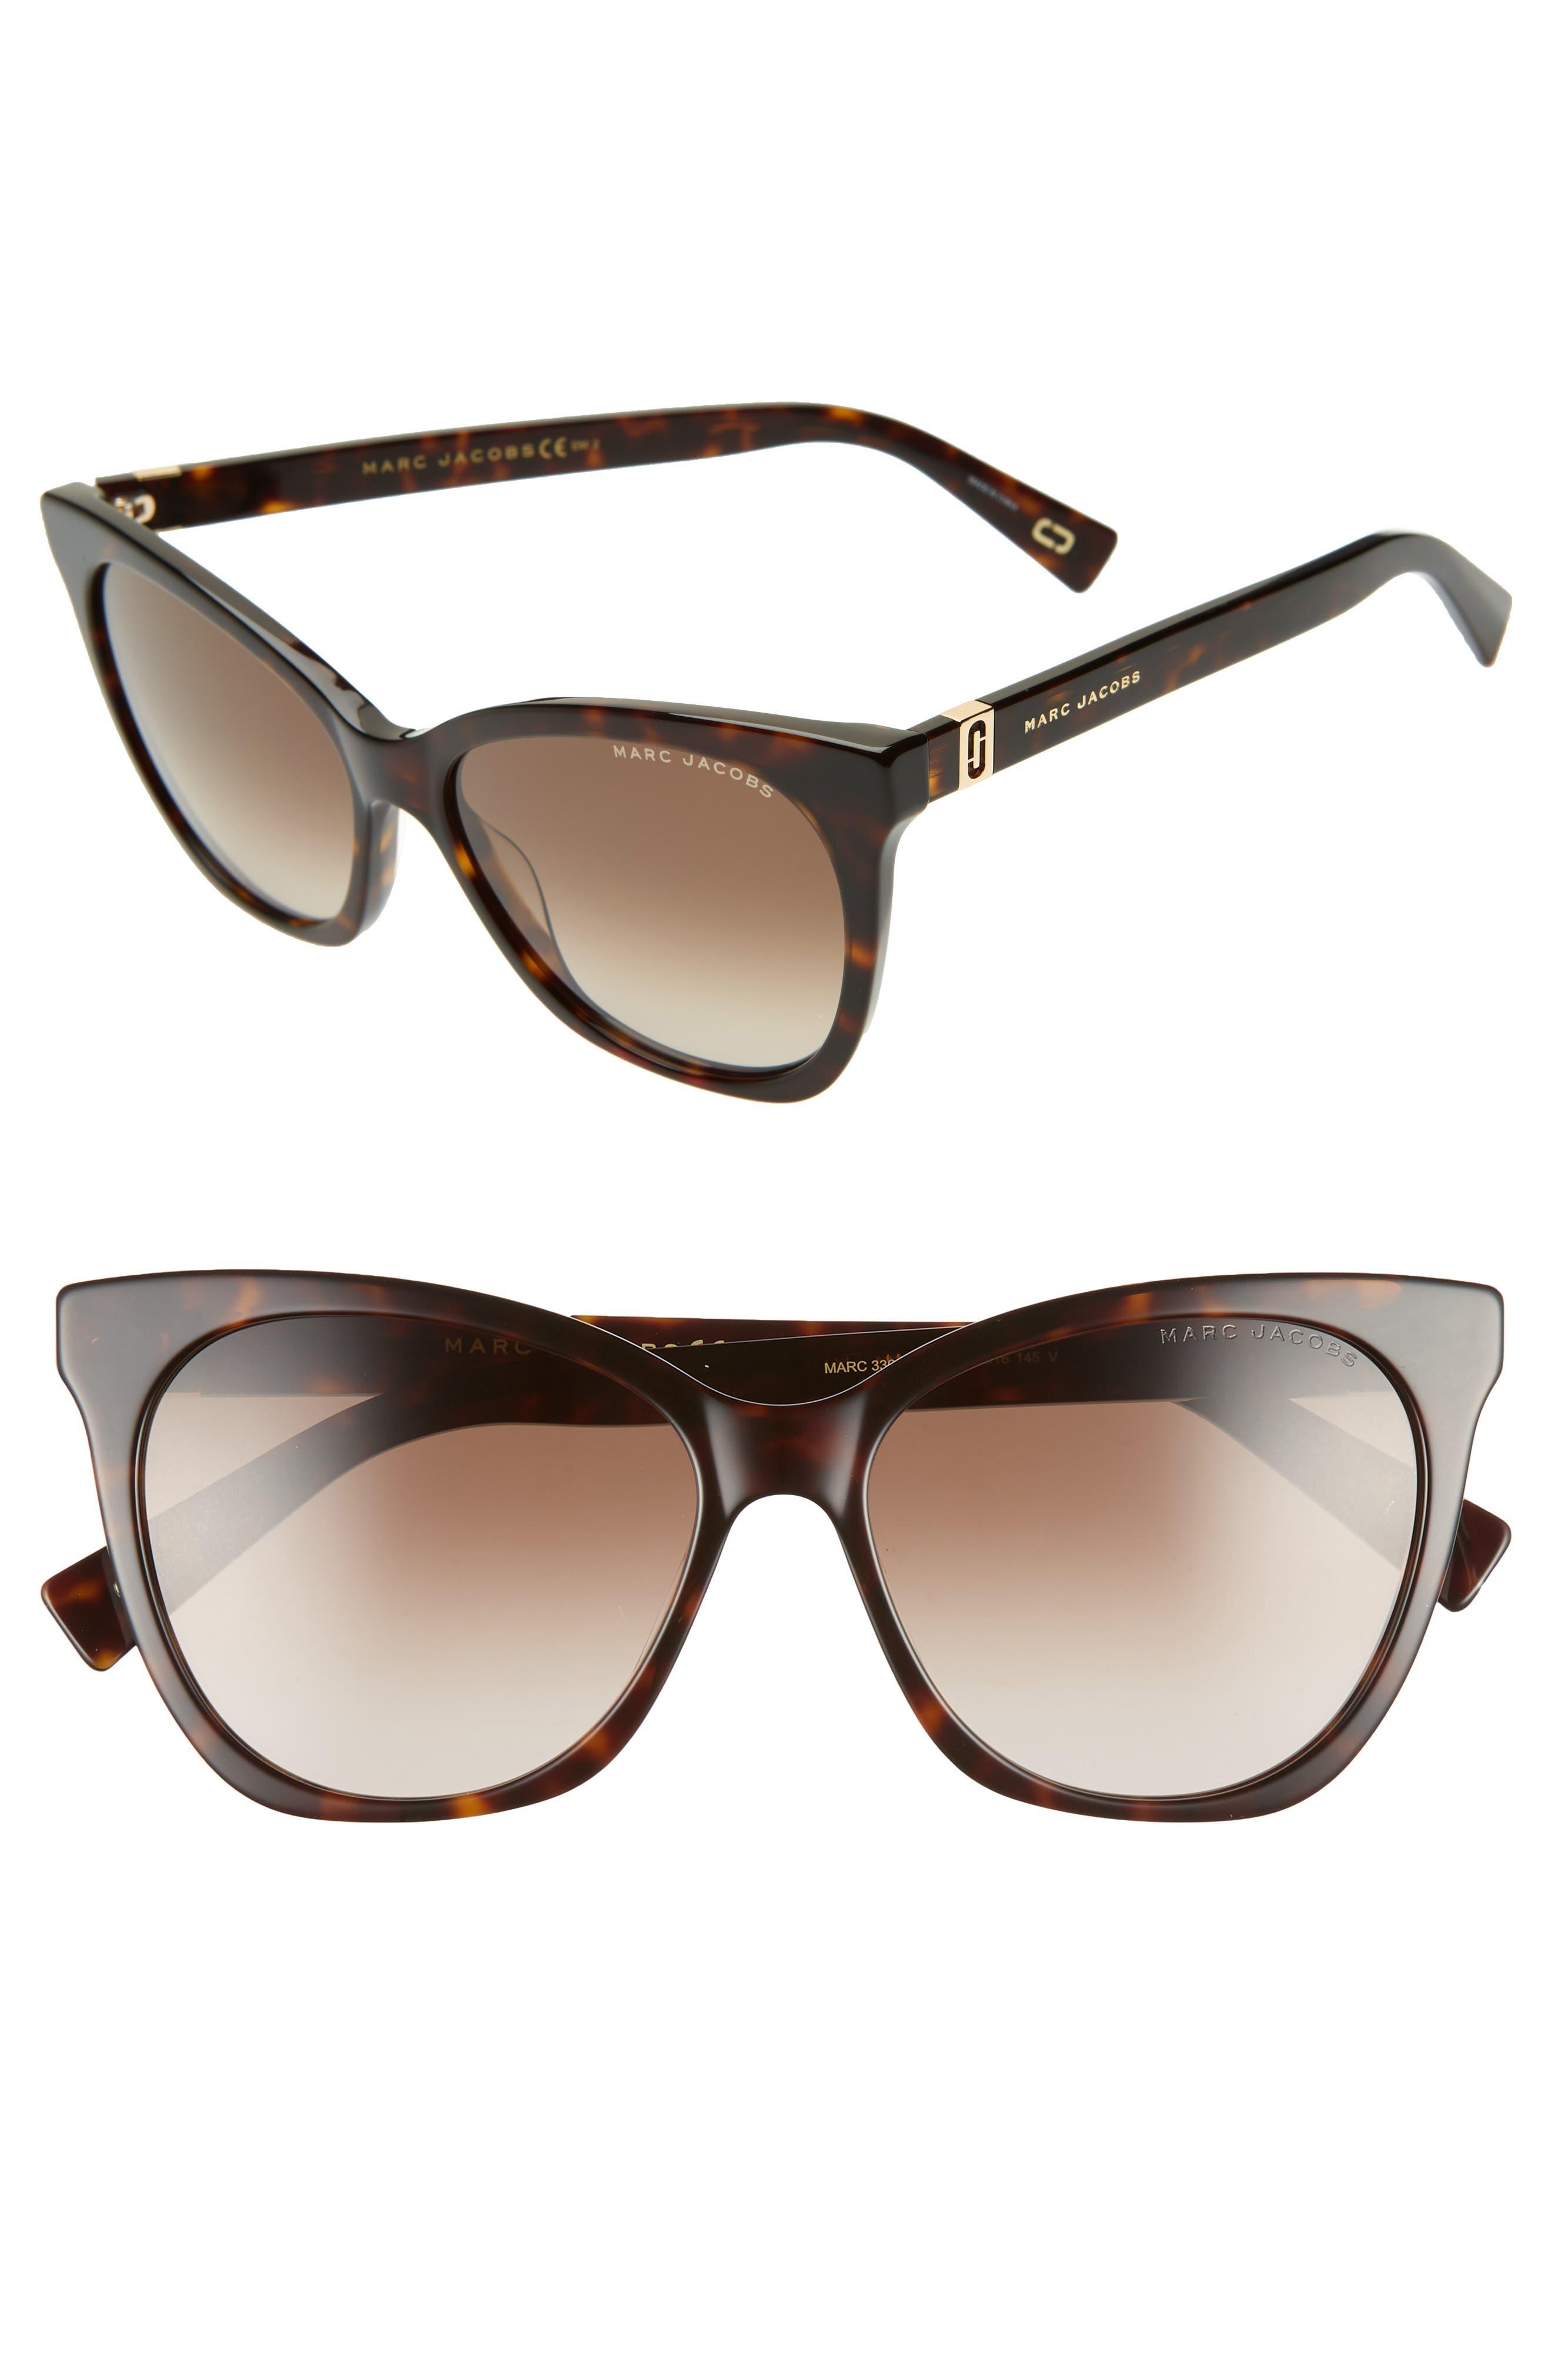 56mm Cat Eye Sunglasses,                             Main thumbnail 1, color,                             DARK HAVANA